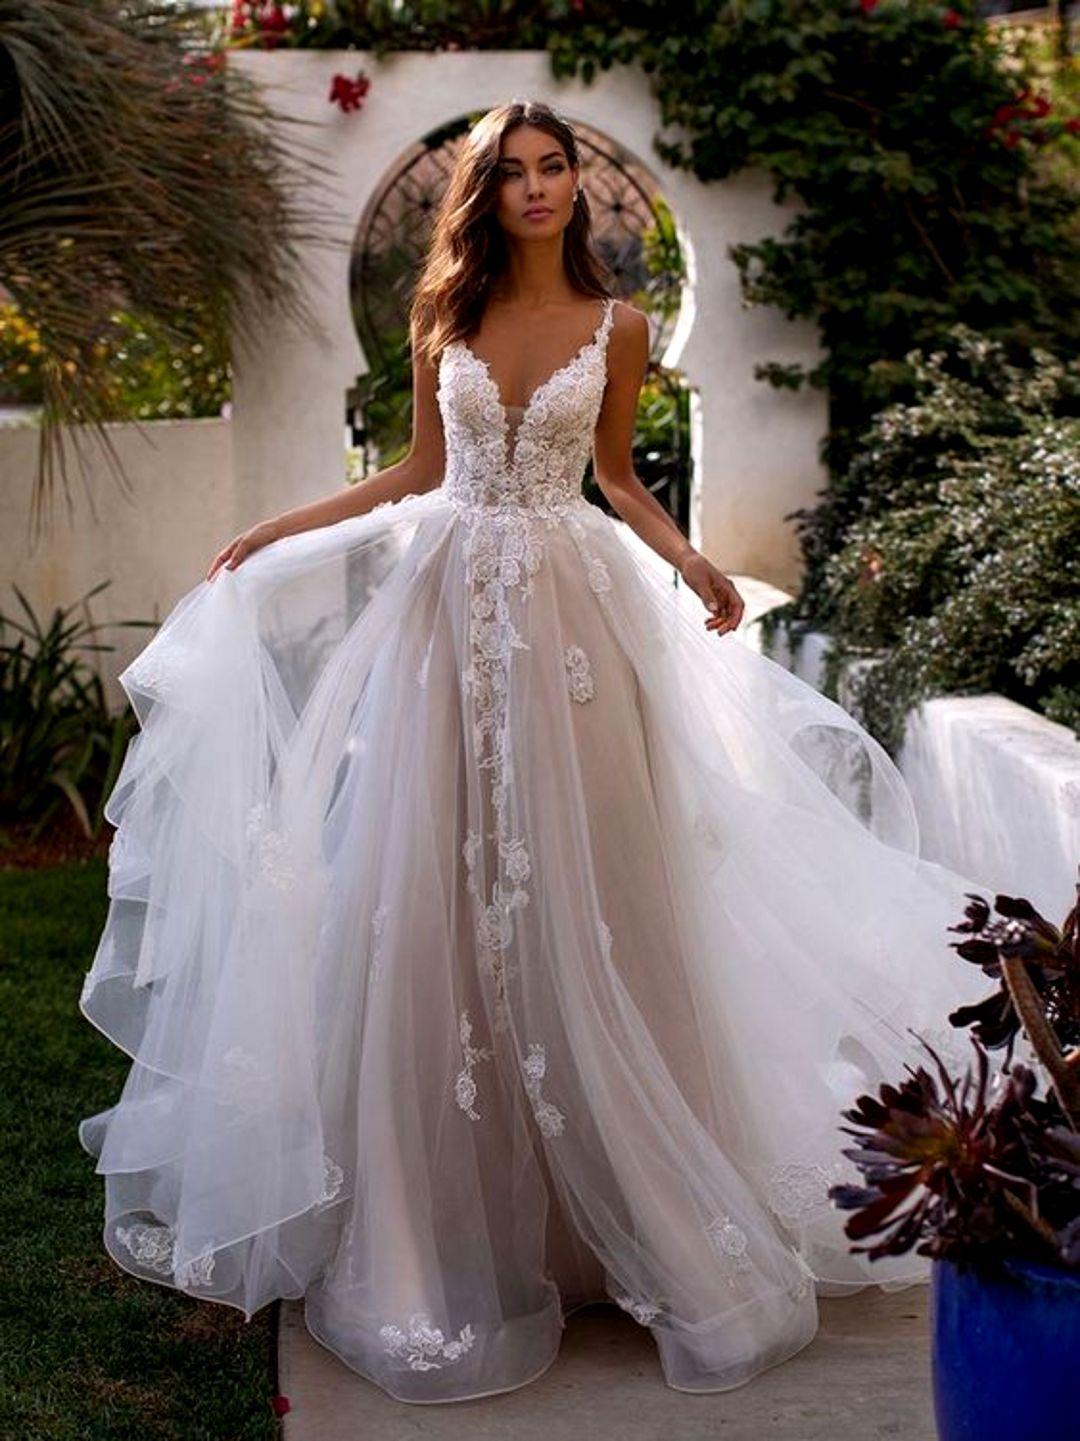 Wedding Dresses and Ideas